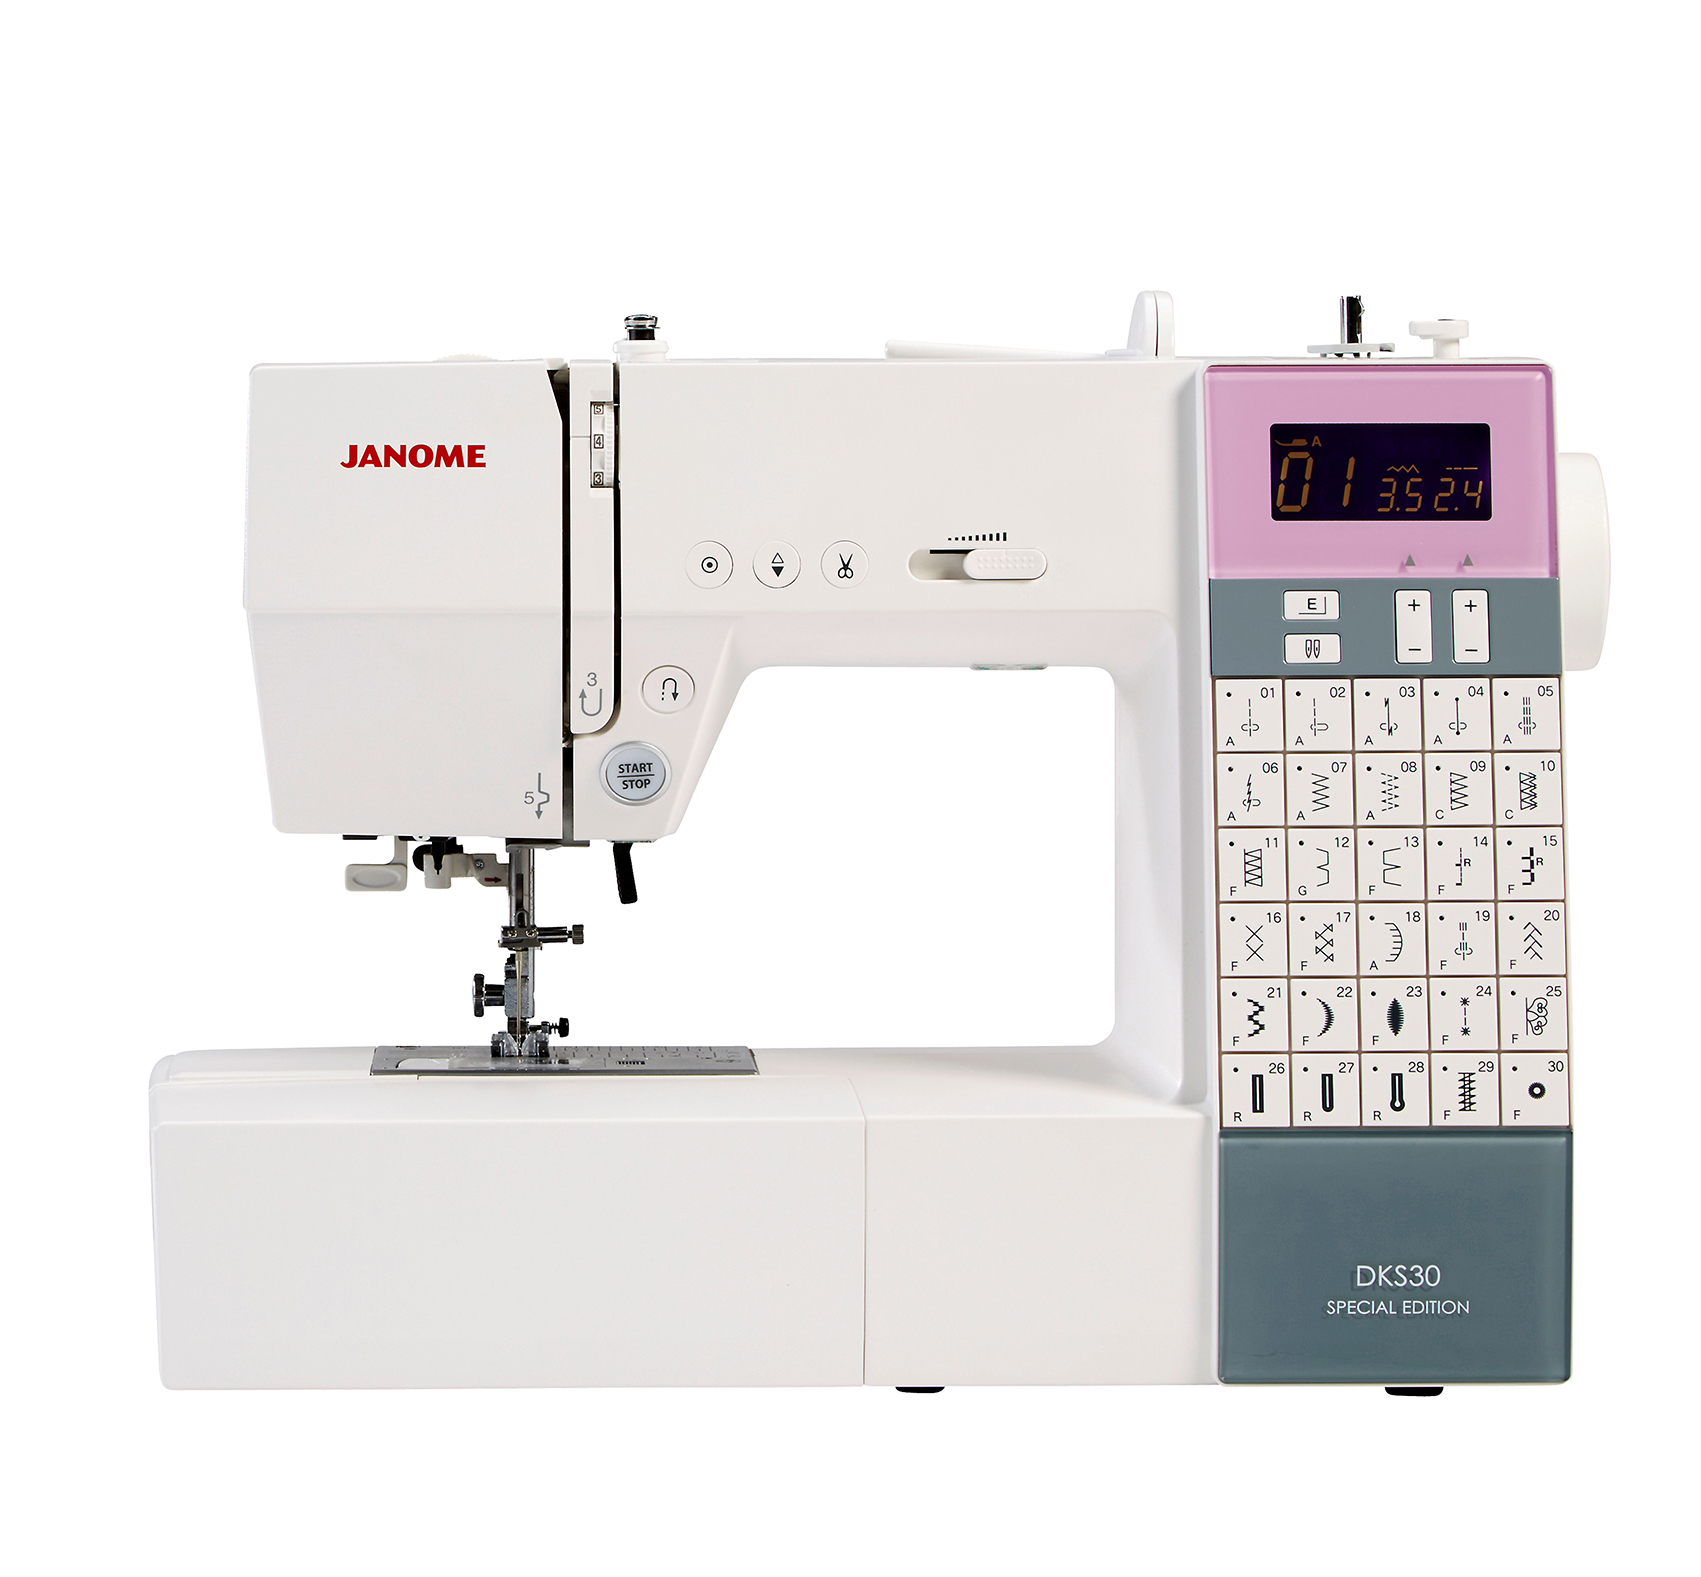 MODEL DKS100 SPECIAL EDITION 00149